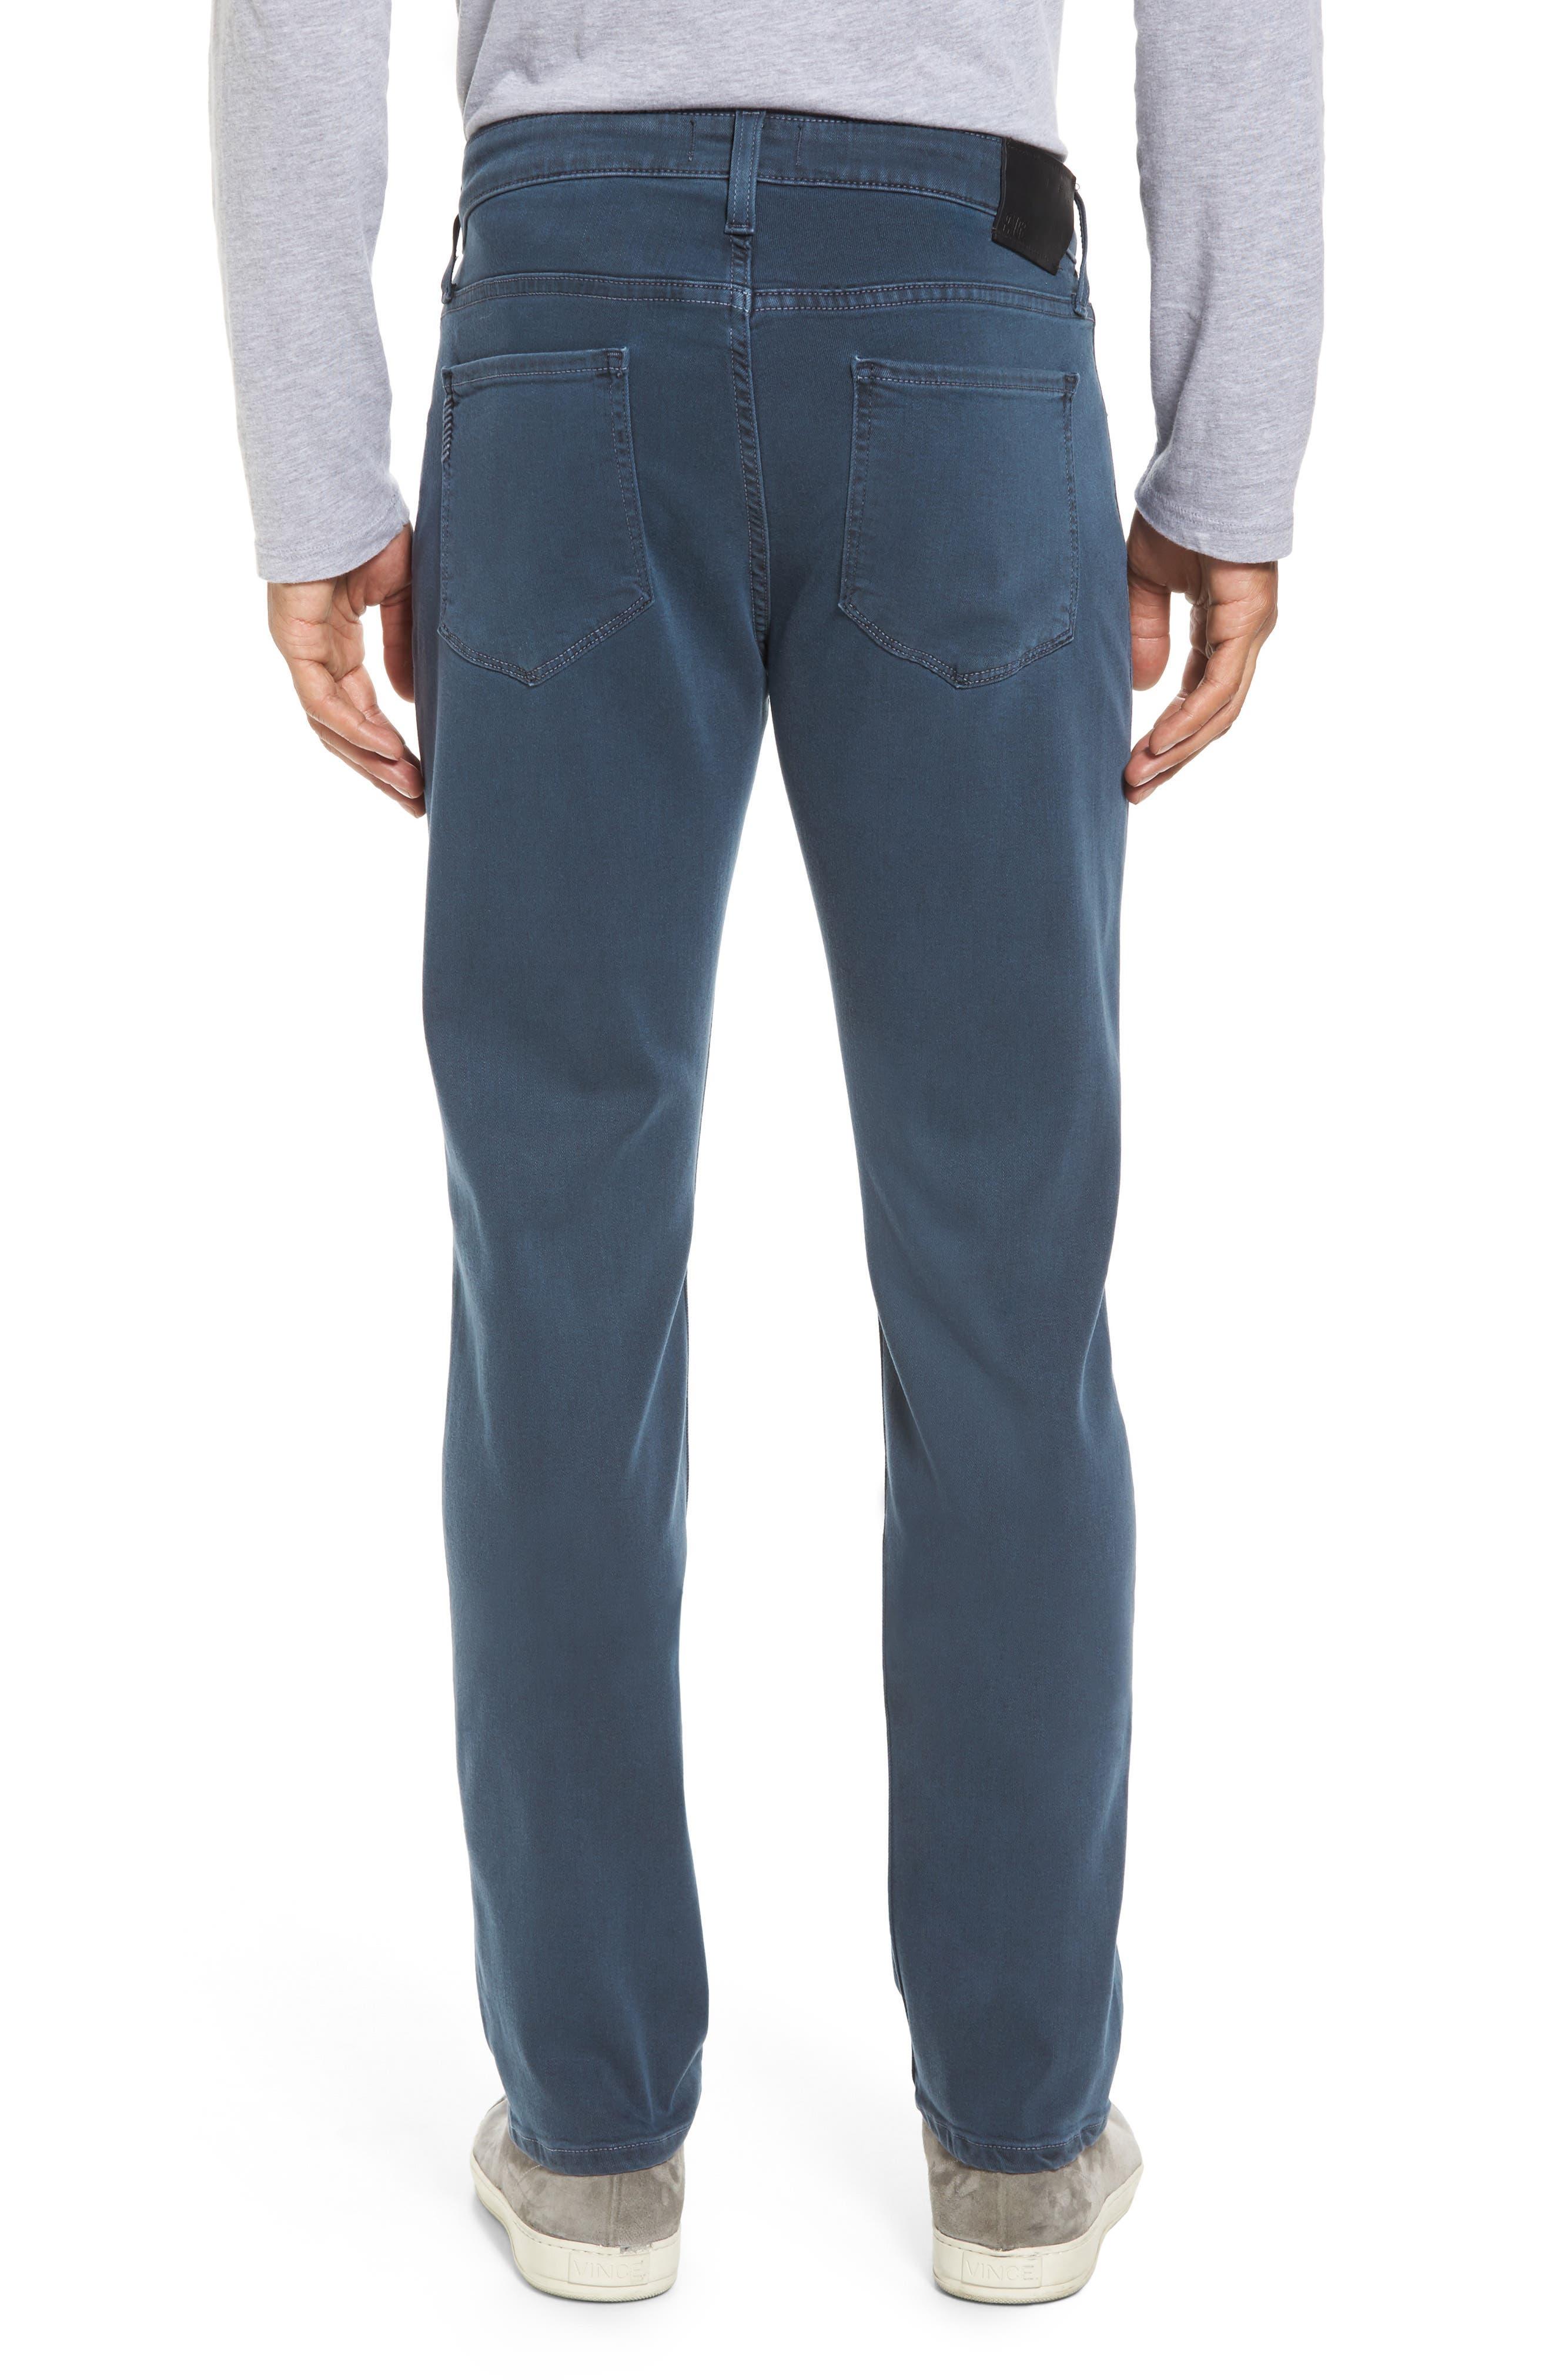 Transcend - Federal Slim Straight Fit Jeans,                             Alternate thumbnail 2, color,                             VINTAGE AMALFI